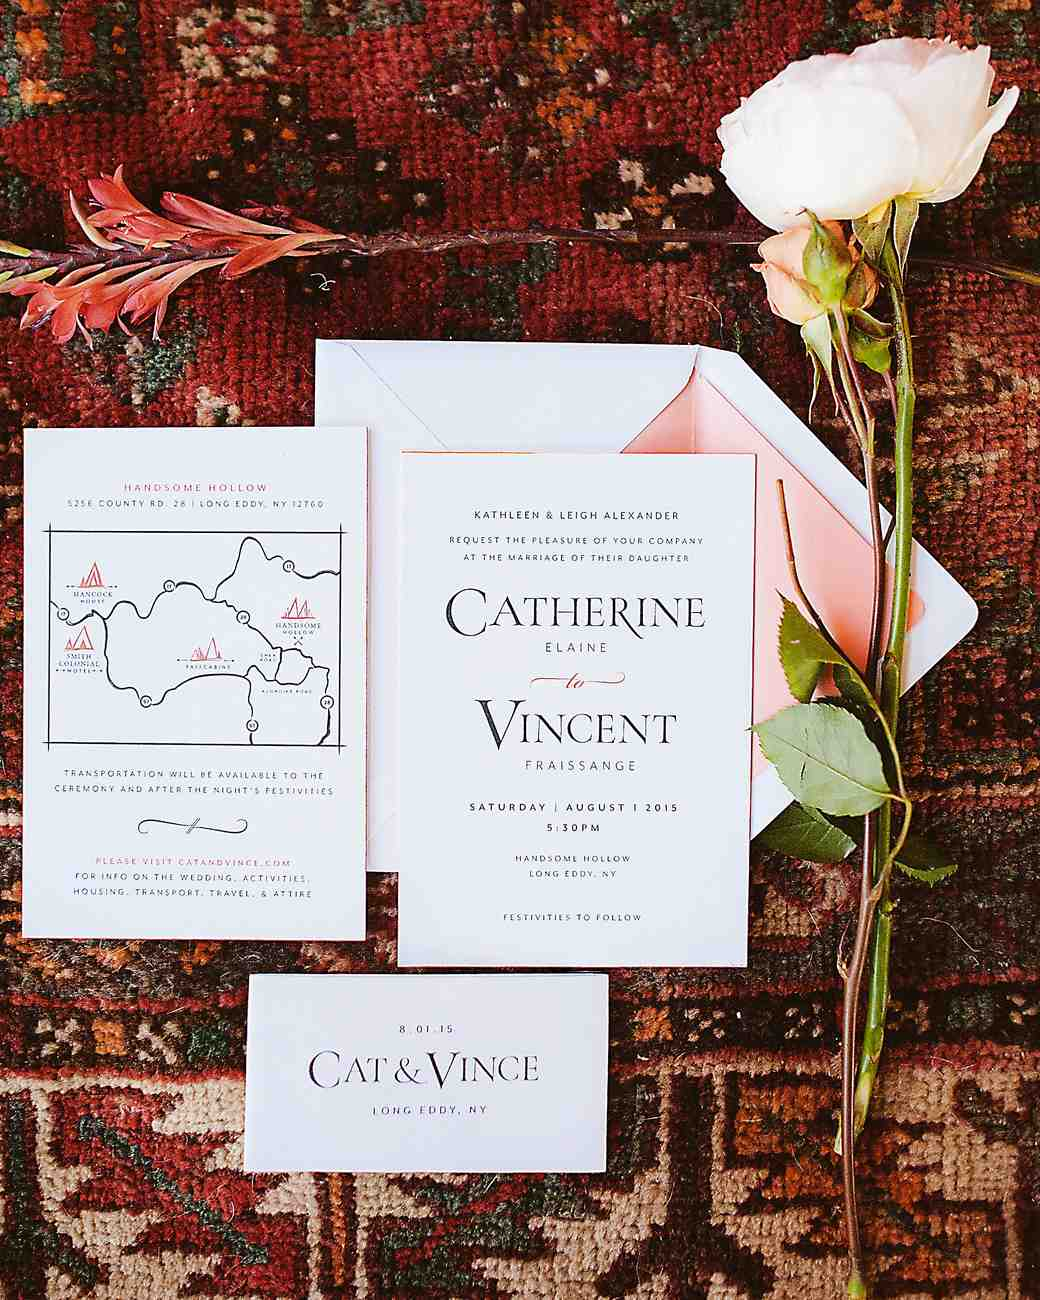 cat-vince-wedding-invite-001-s112646-0216.jpg